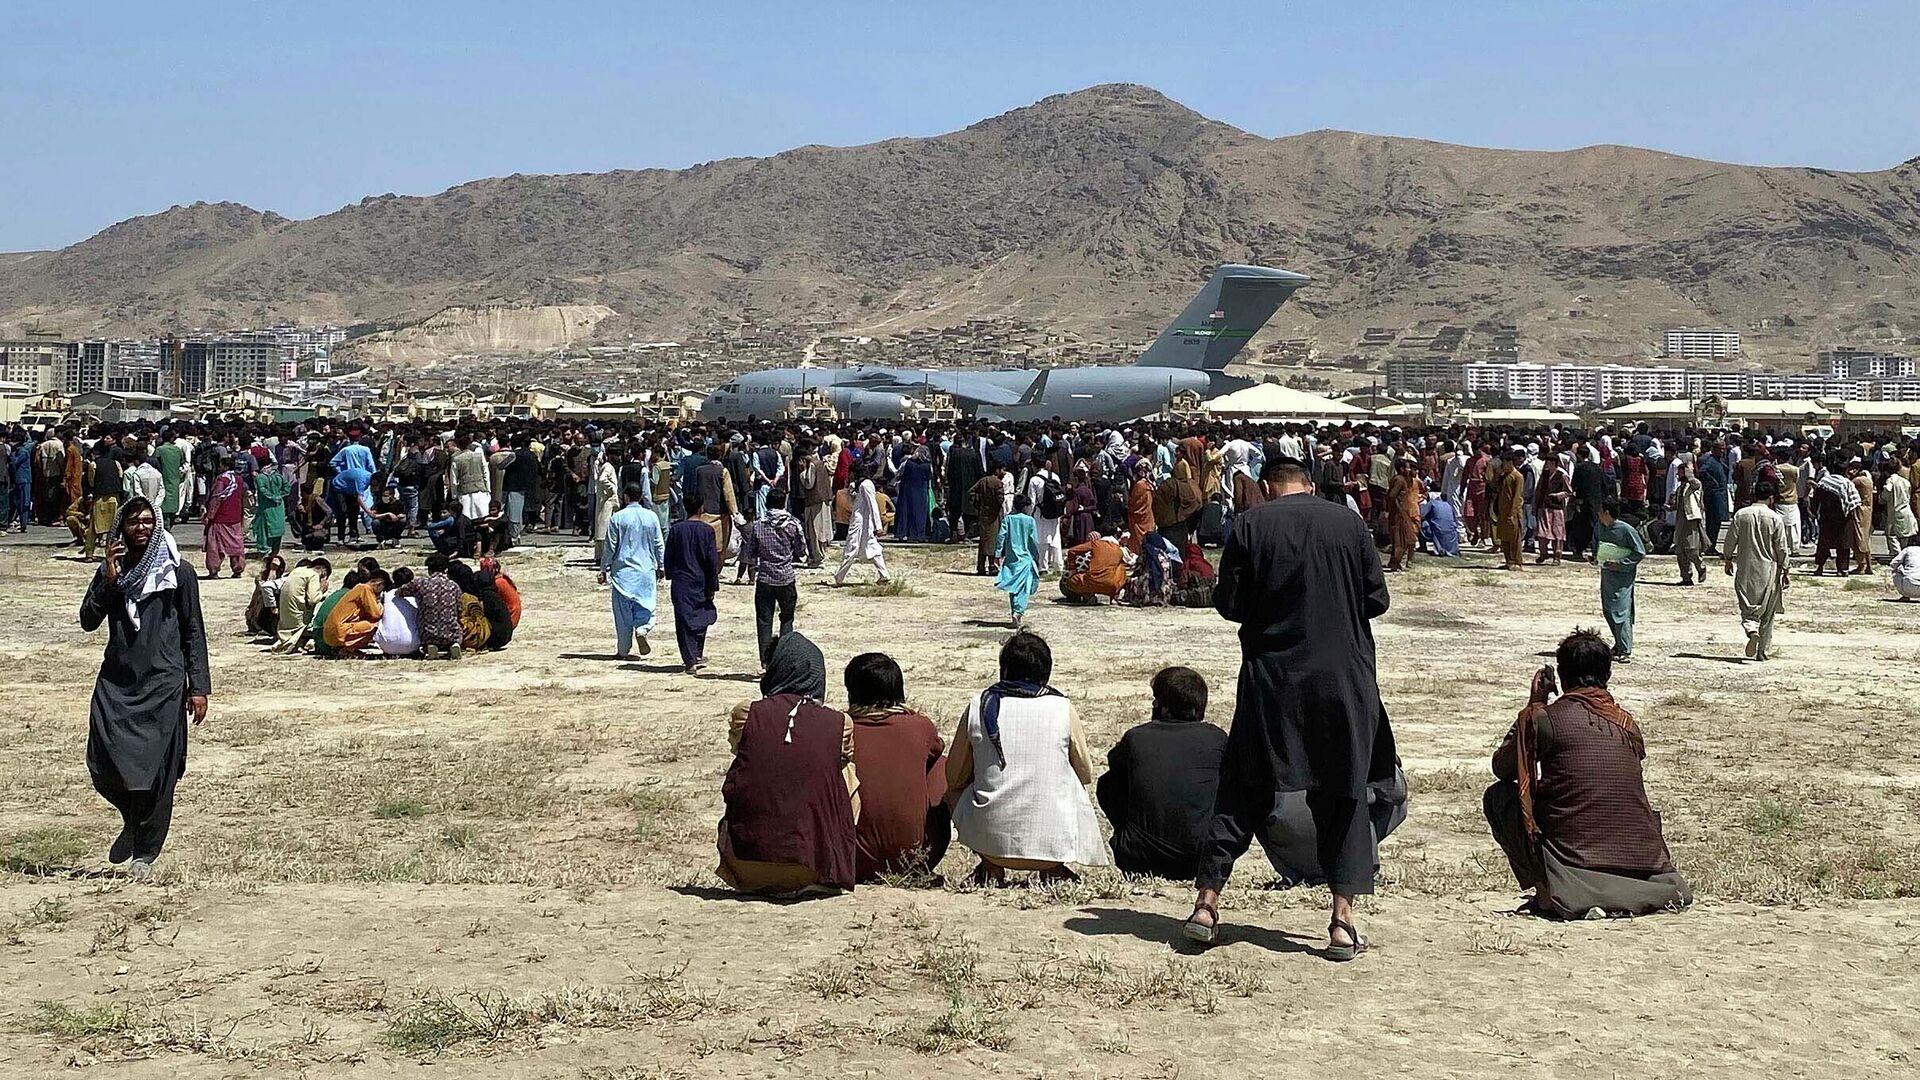 Люди в аэропорту Кабула - РИА Новости, 1920, 26.08.2021